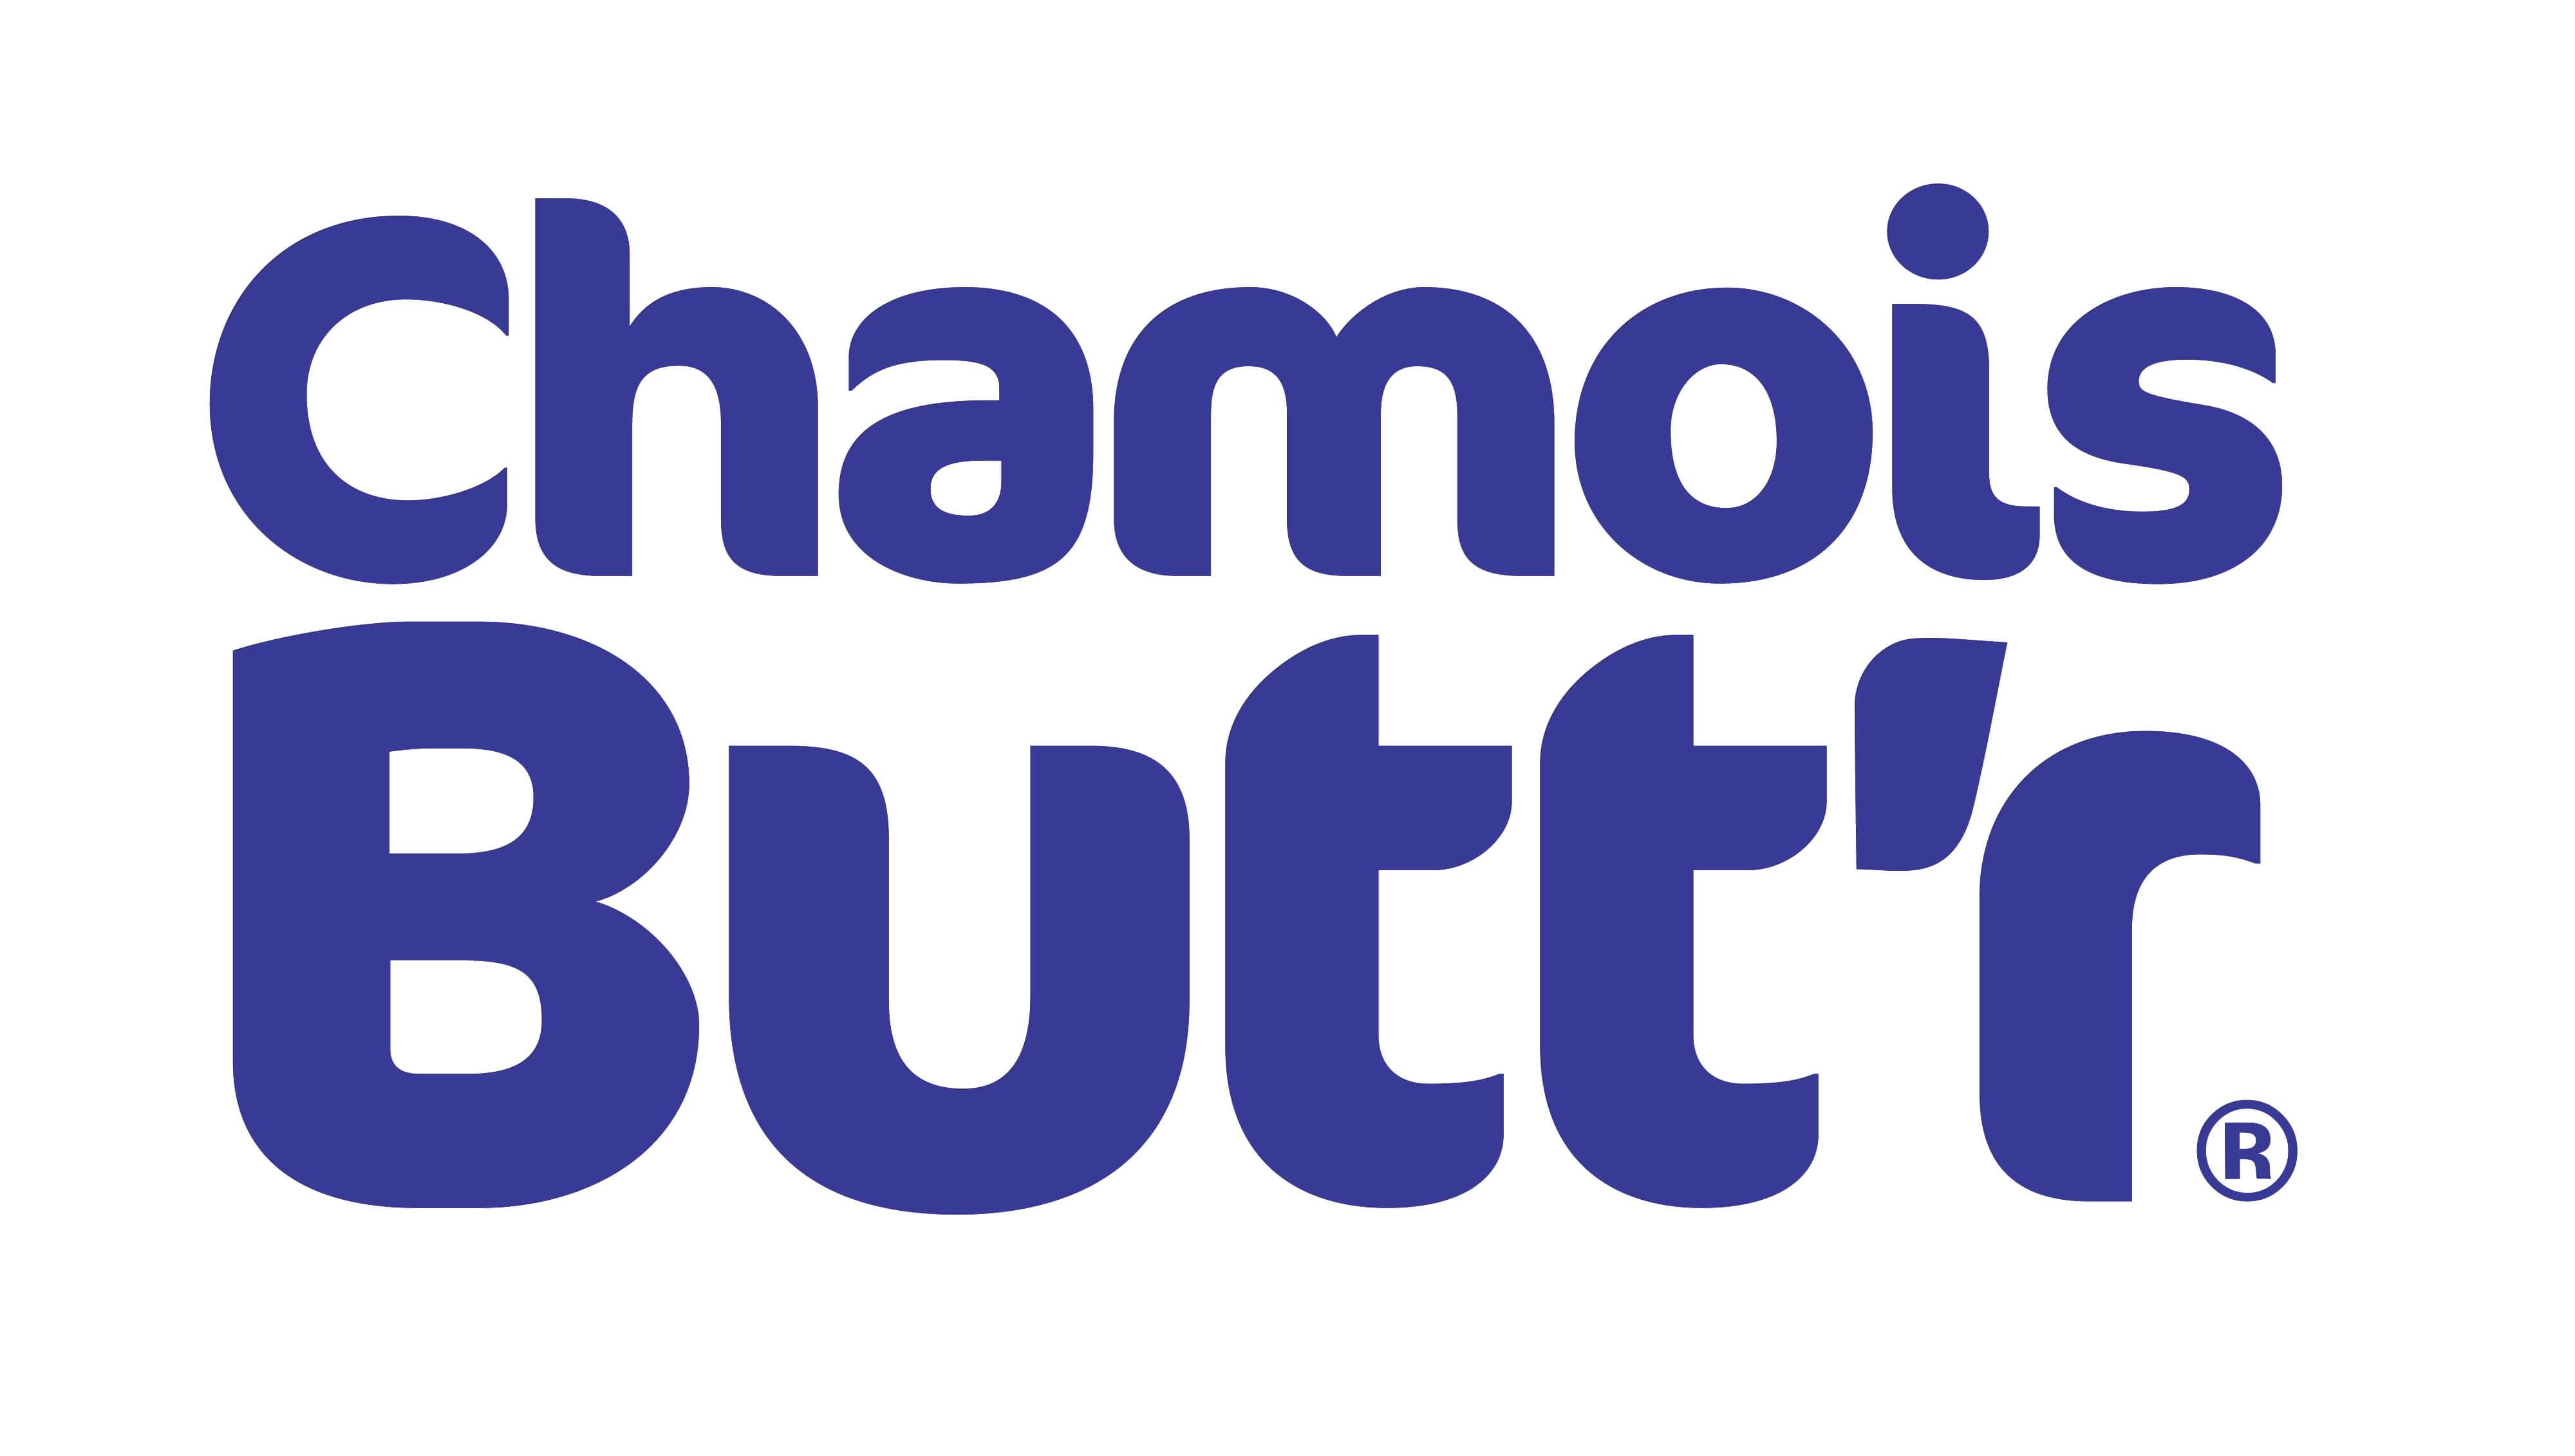 ChamoisButtr2016_Purple.jpg